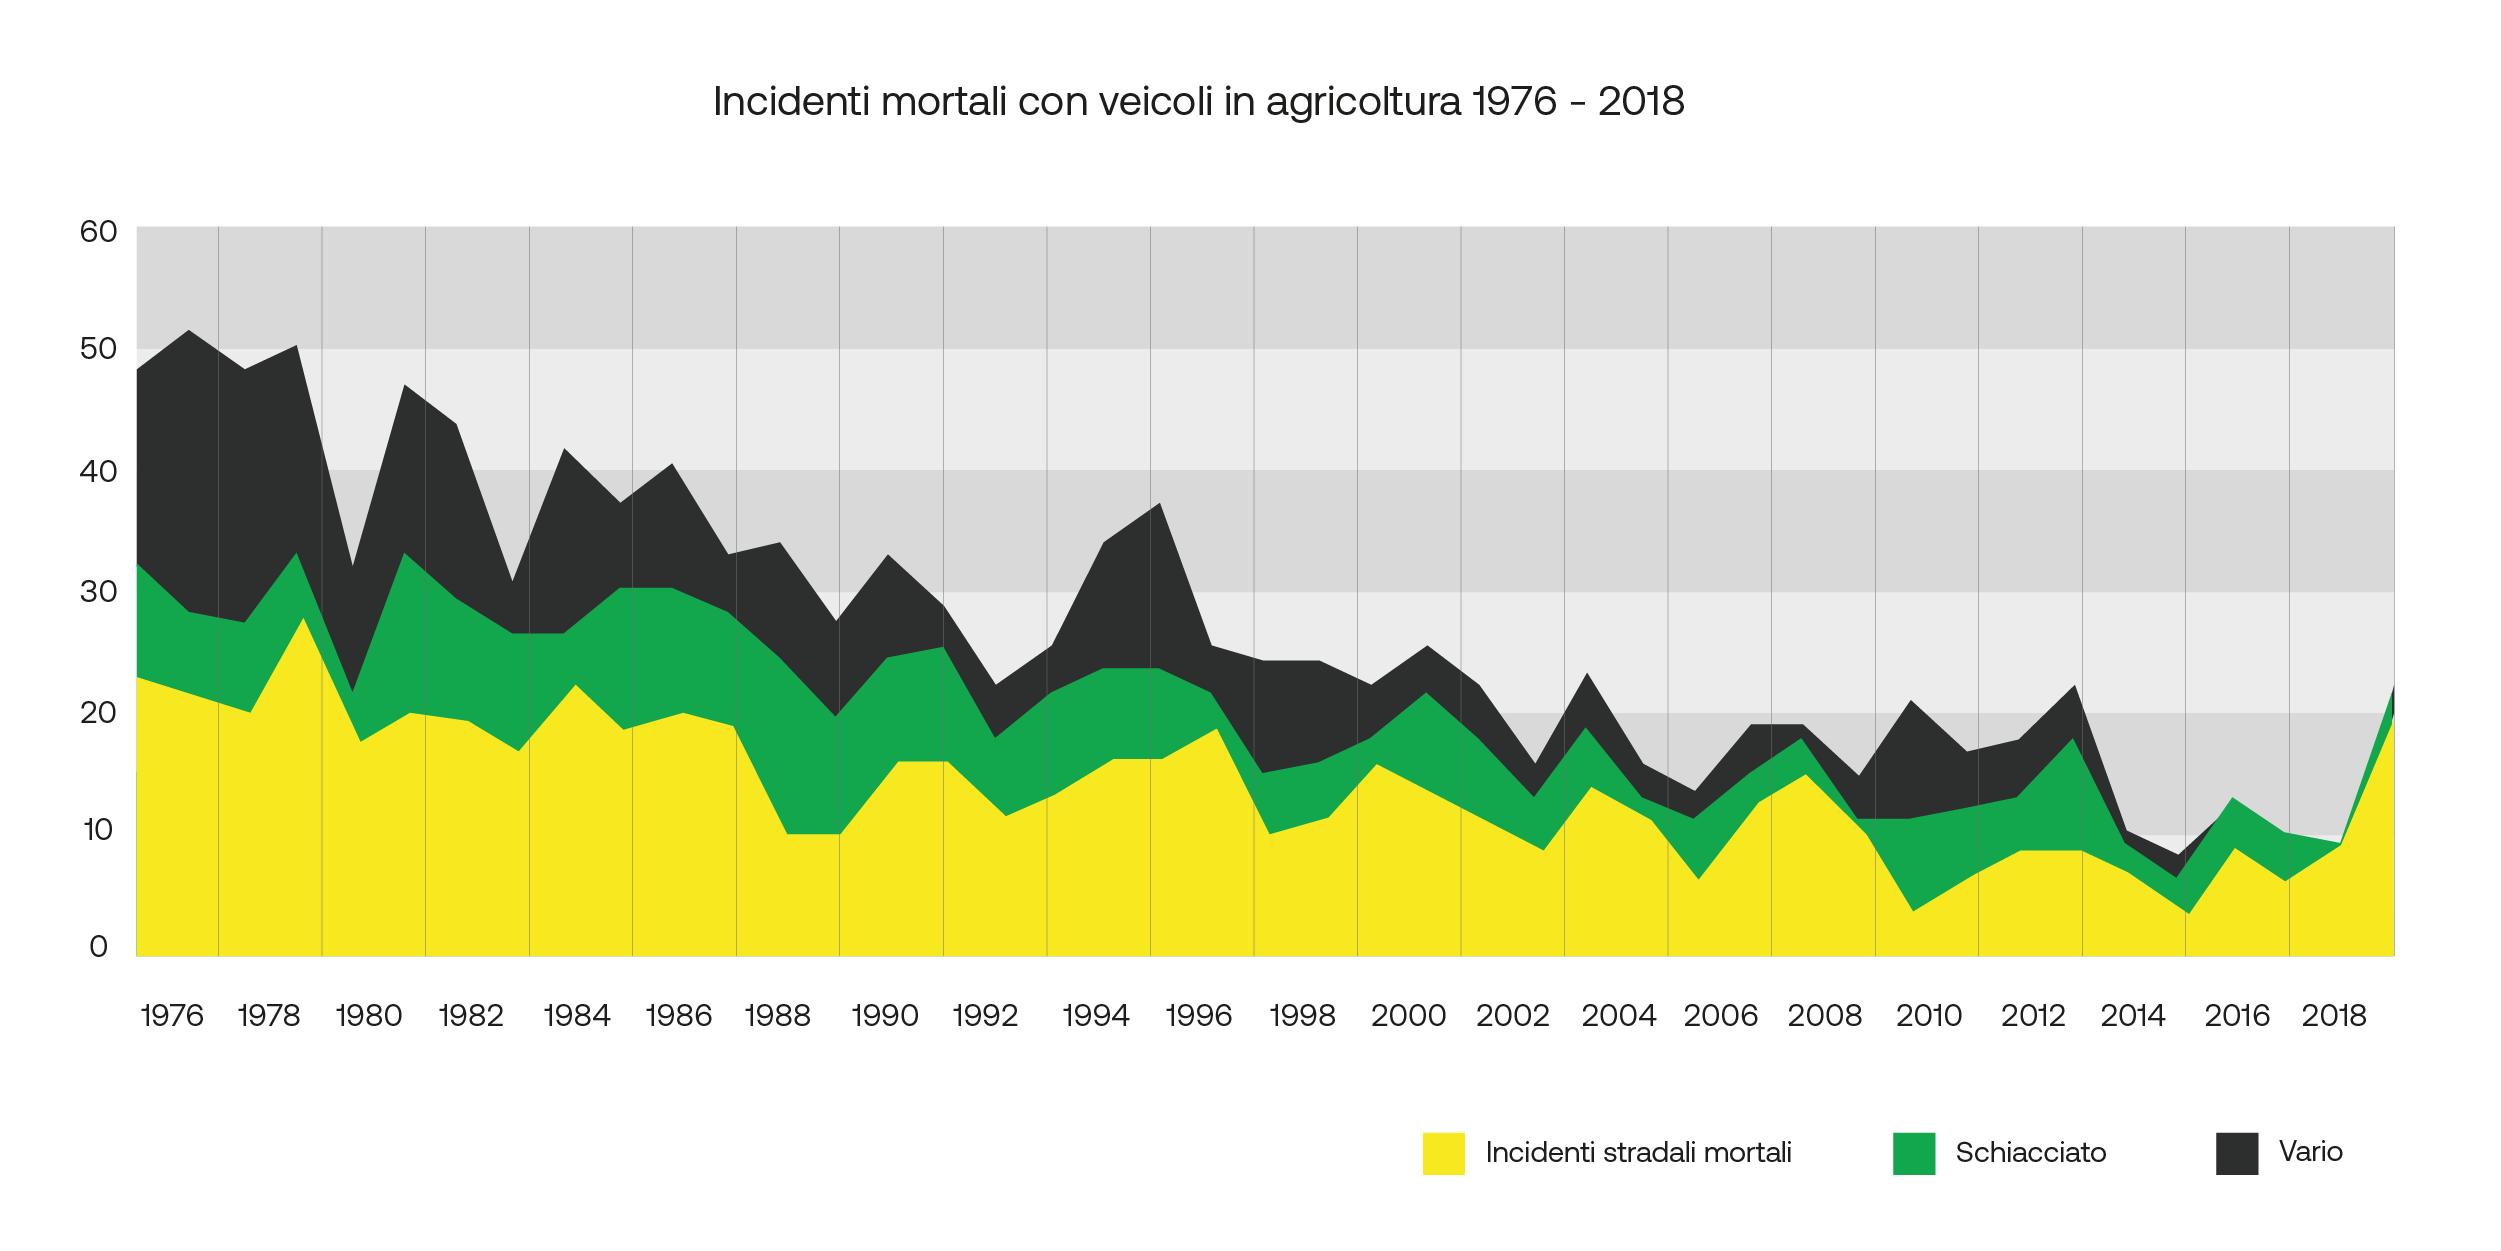 SAW_Graph_Italienisch_311019-16.png